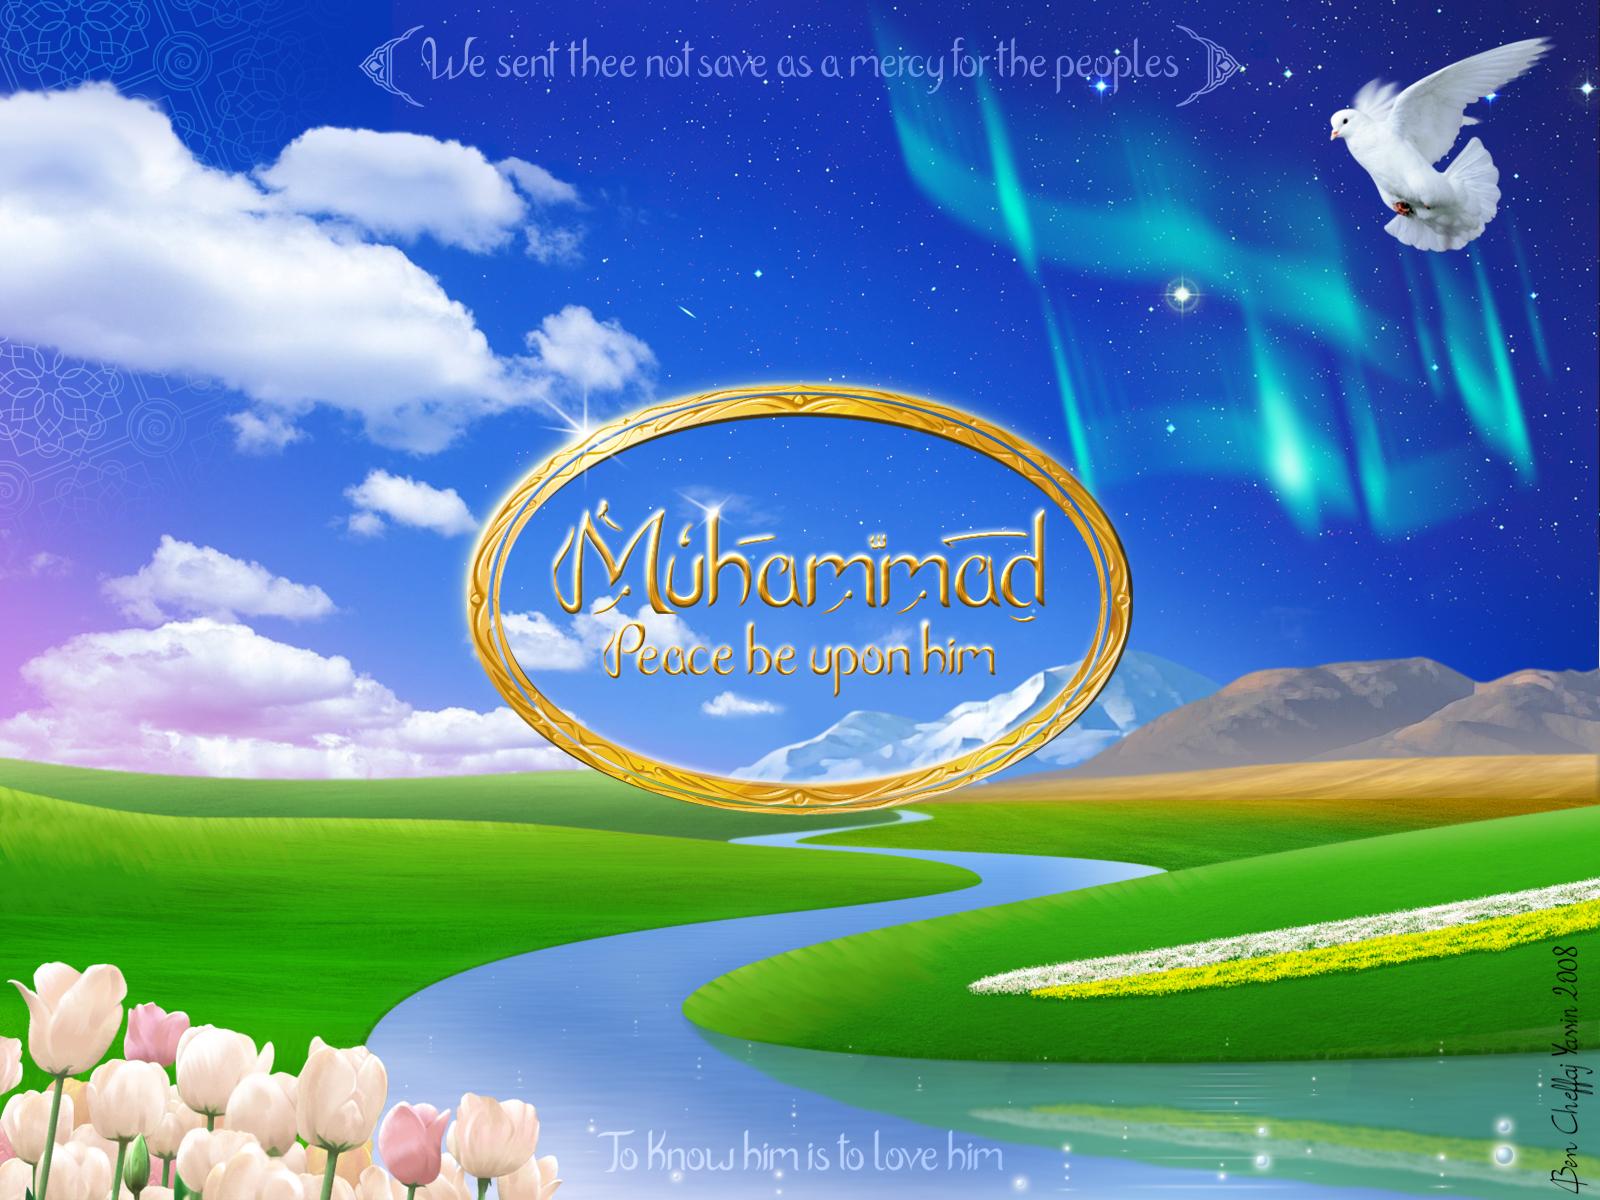 http://2.bp.blogspot.com/-HEGTUtNu7wg/TbHAjT2_MLI/AAAAAAAAAAc/pAsA2f4J_LQ/s1600/Islamic_wallpaper___landscape_by_NeoYas.jpg